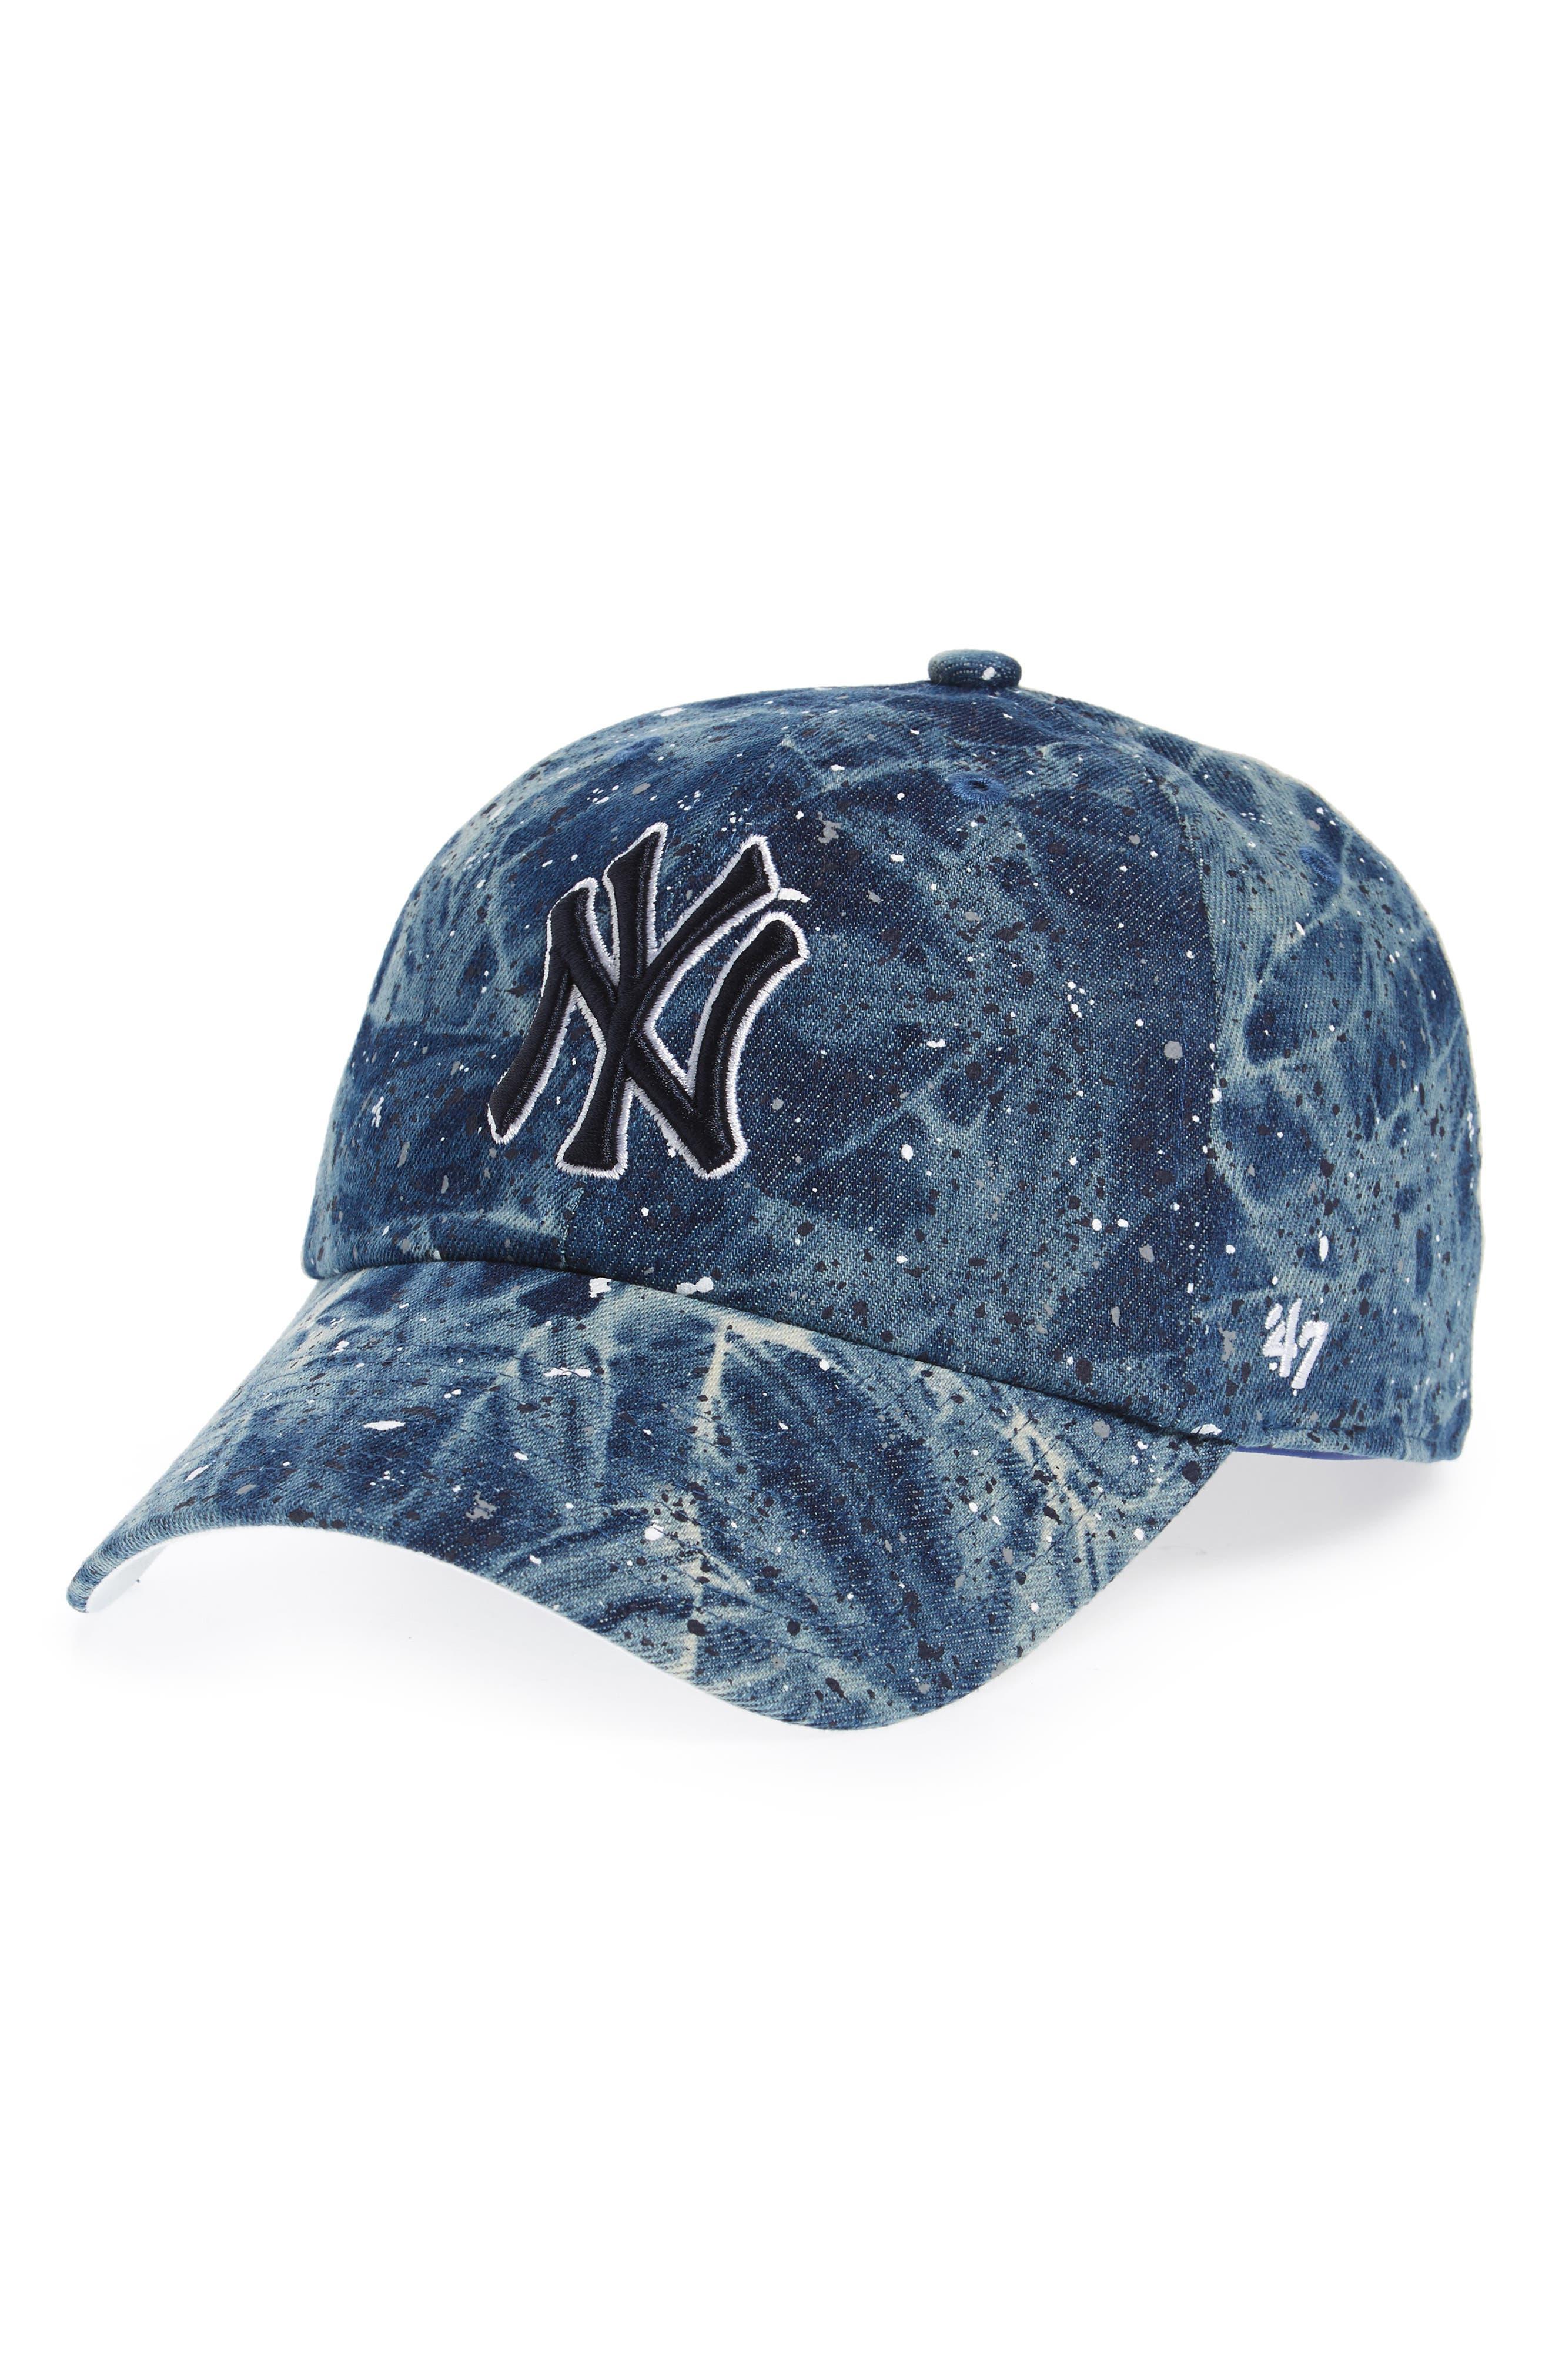 New York Yankees - Blue Splatter Baseball Cap,                             Main thumbnail 1, color,                             400